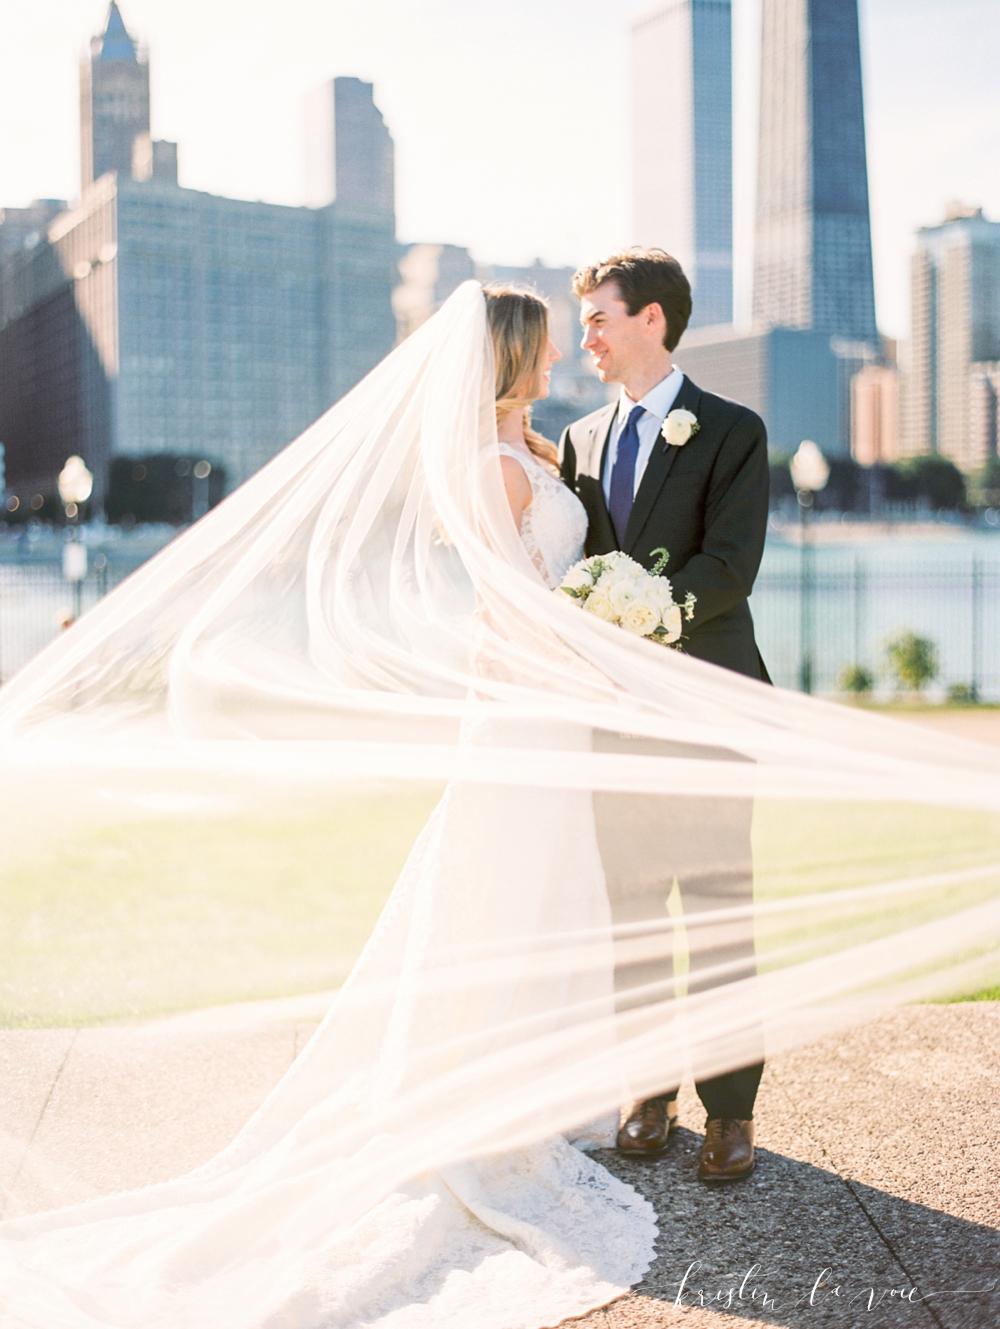 Lauren + Brendan | Chicago wedding | Liancarlo 5802 from Little White Dress Bridal Shop in Denver | Kristin La Voie photography